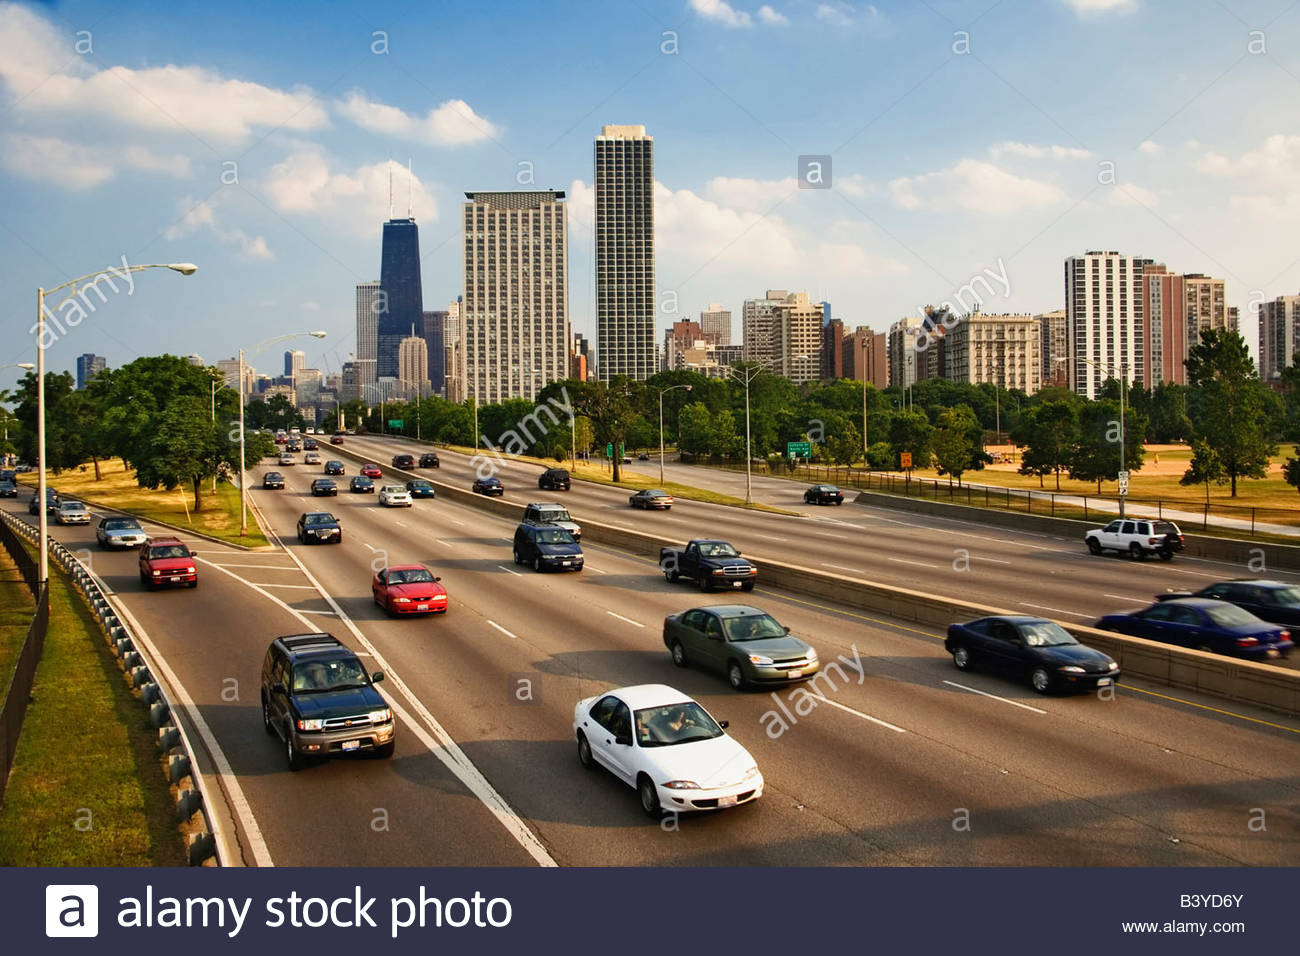 Expressway Usa America Stock Photos & Expressway Usa America Stock ...